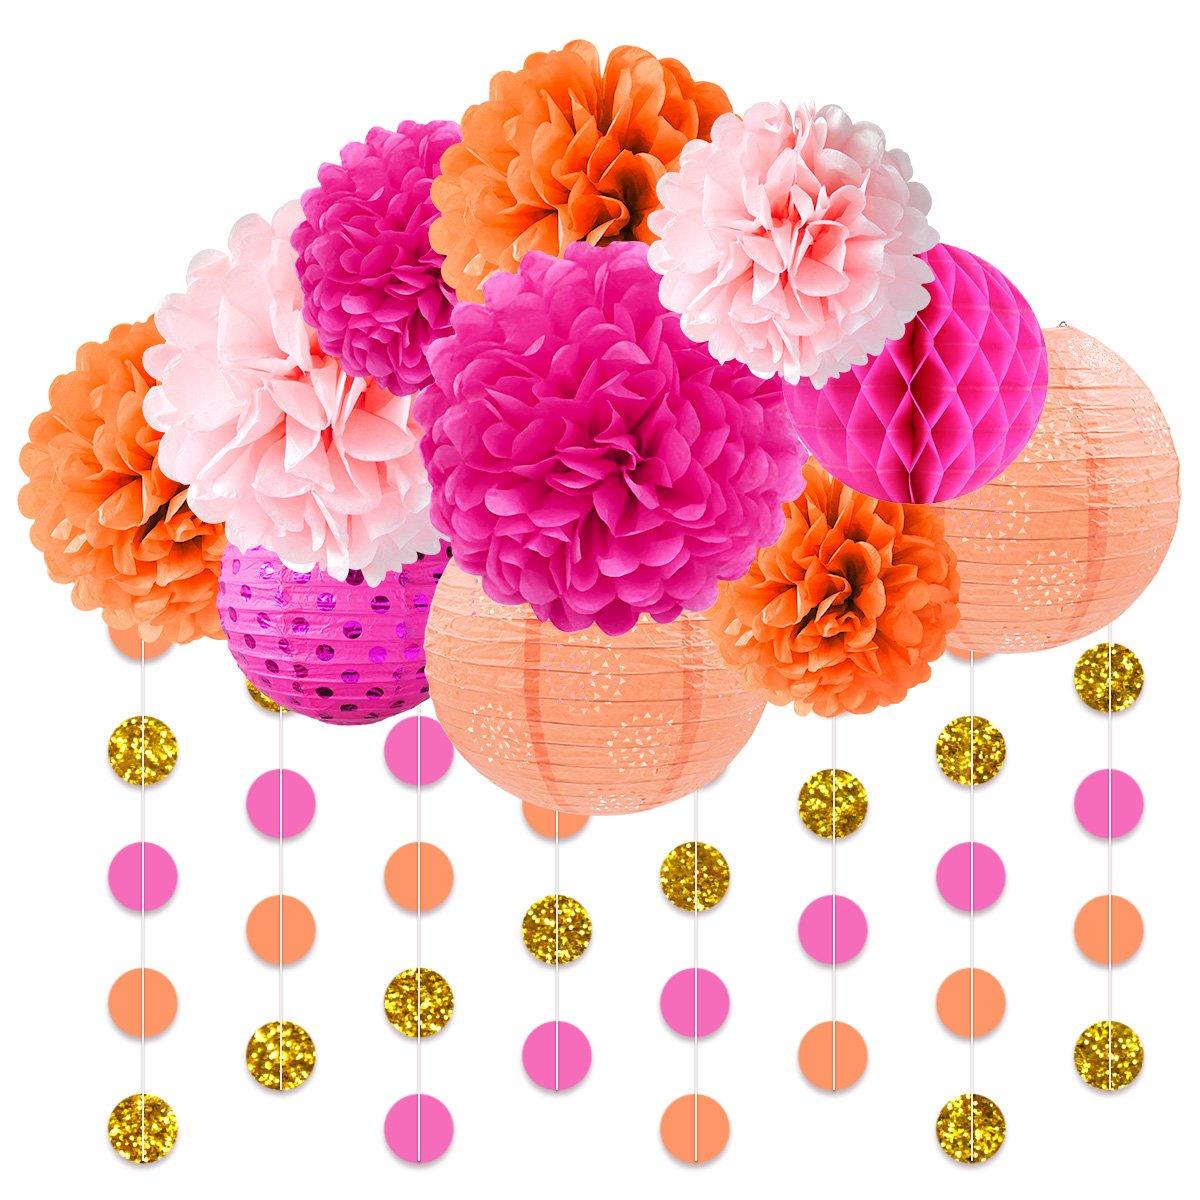 NICROLANDEE Pink and Orange Birthday Party Decoration Pack Paper Lanterns Tissue Flower Poms Gold Glitter Garland for Flamingo Bachelorette Birthday Baby Shower Thanksgiving Fiesta Festival Decor